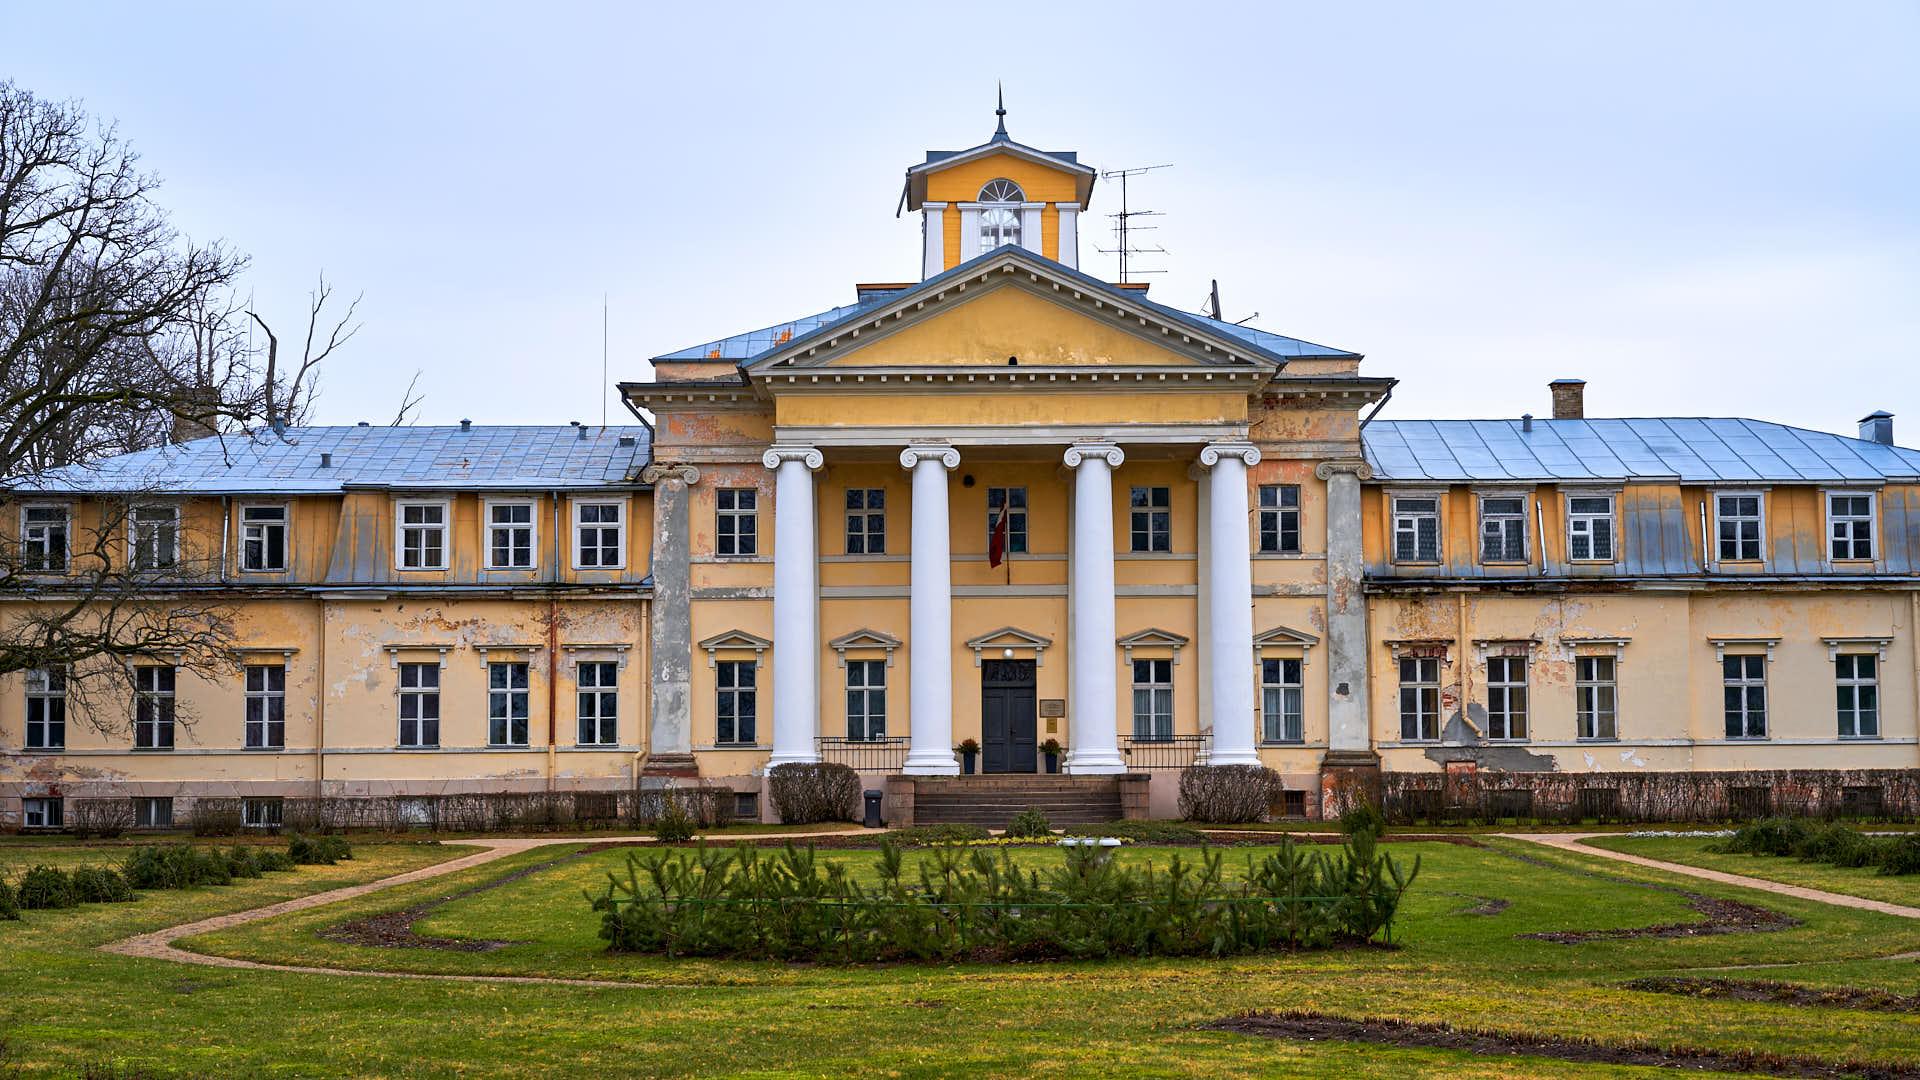 View of the Krimulda Manor near Sigulda